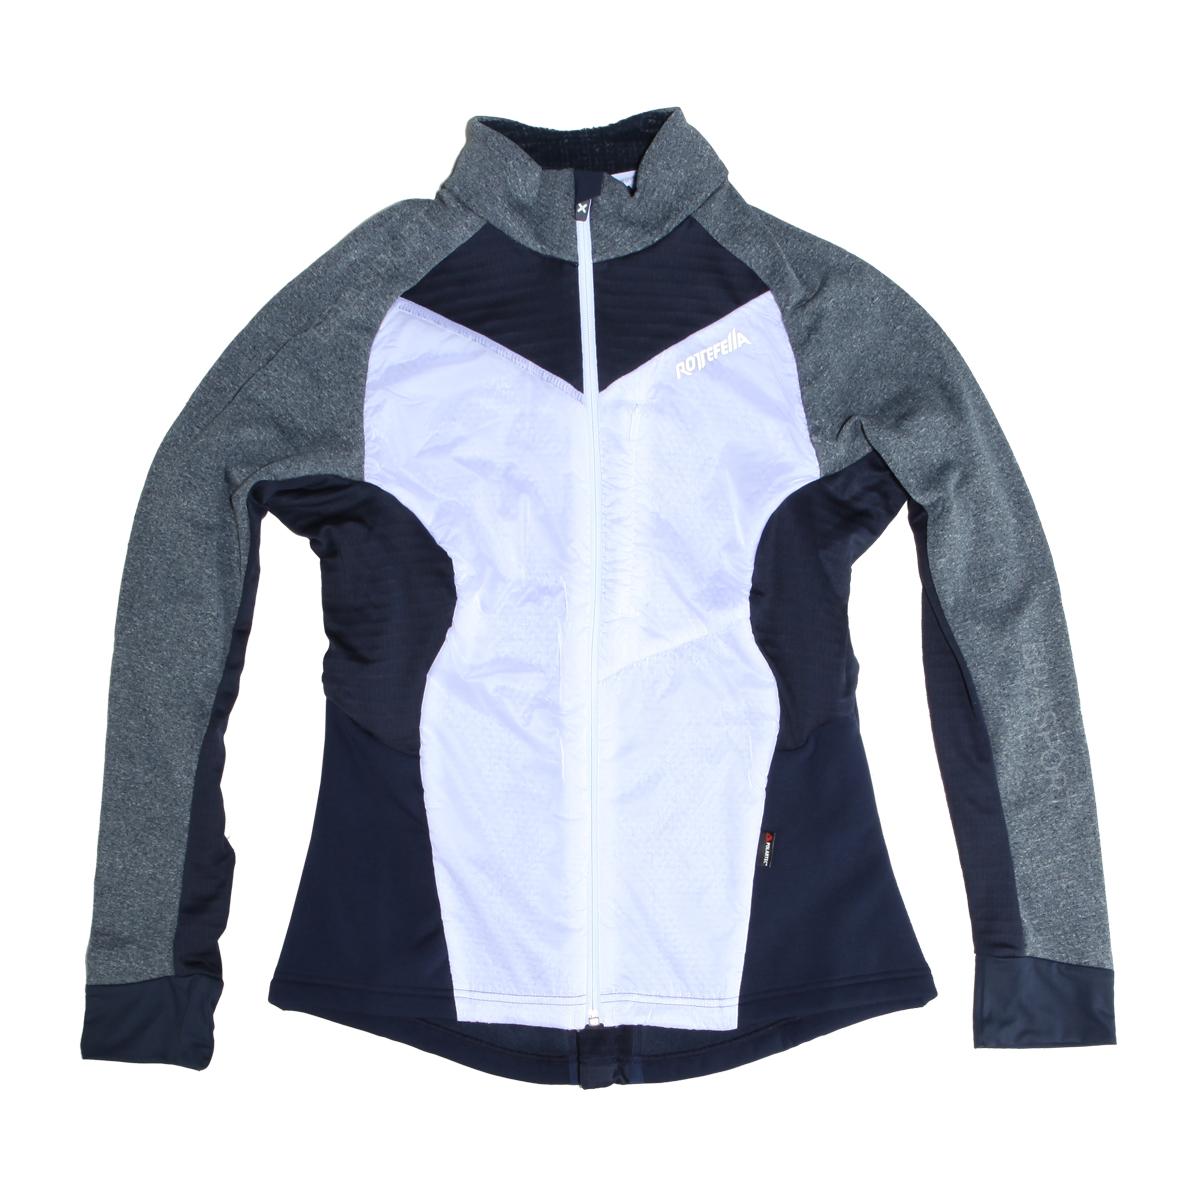 impulse jacket bright white.jpg